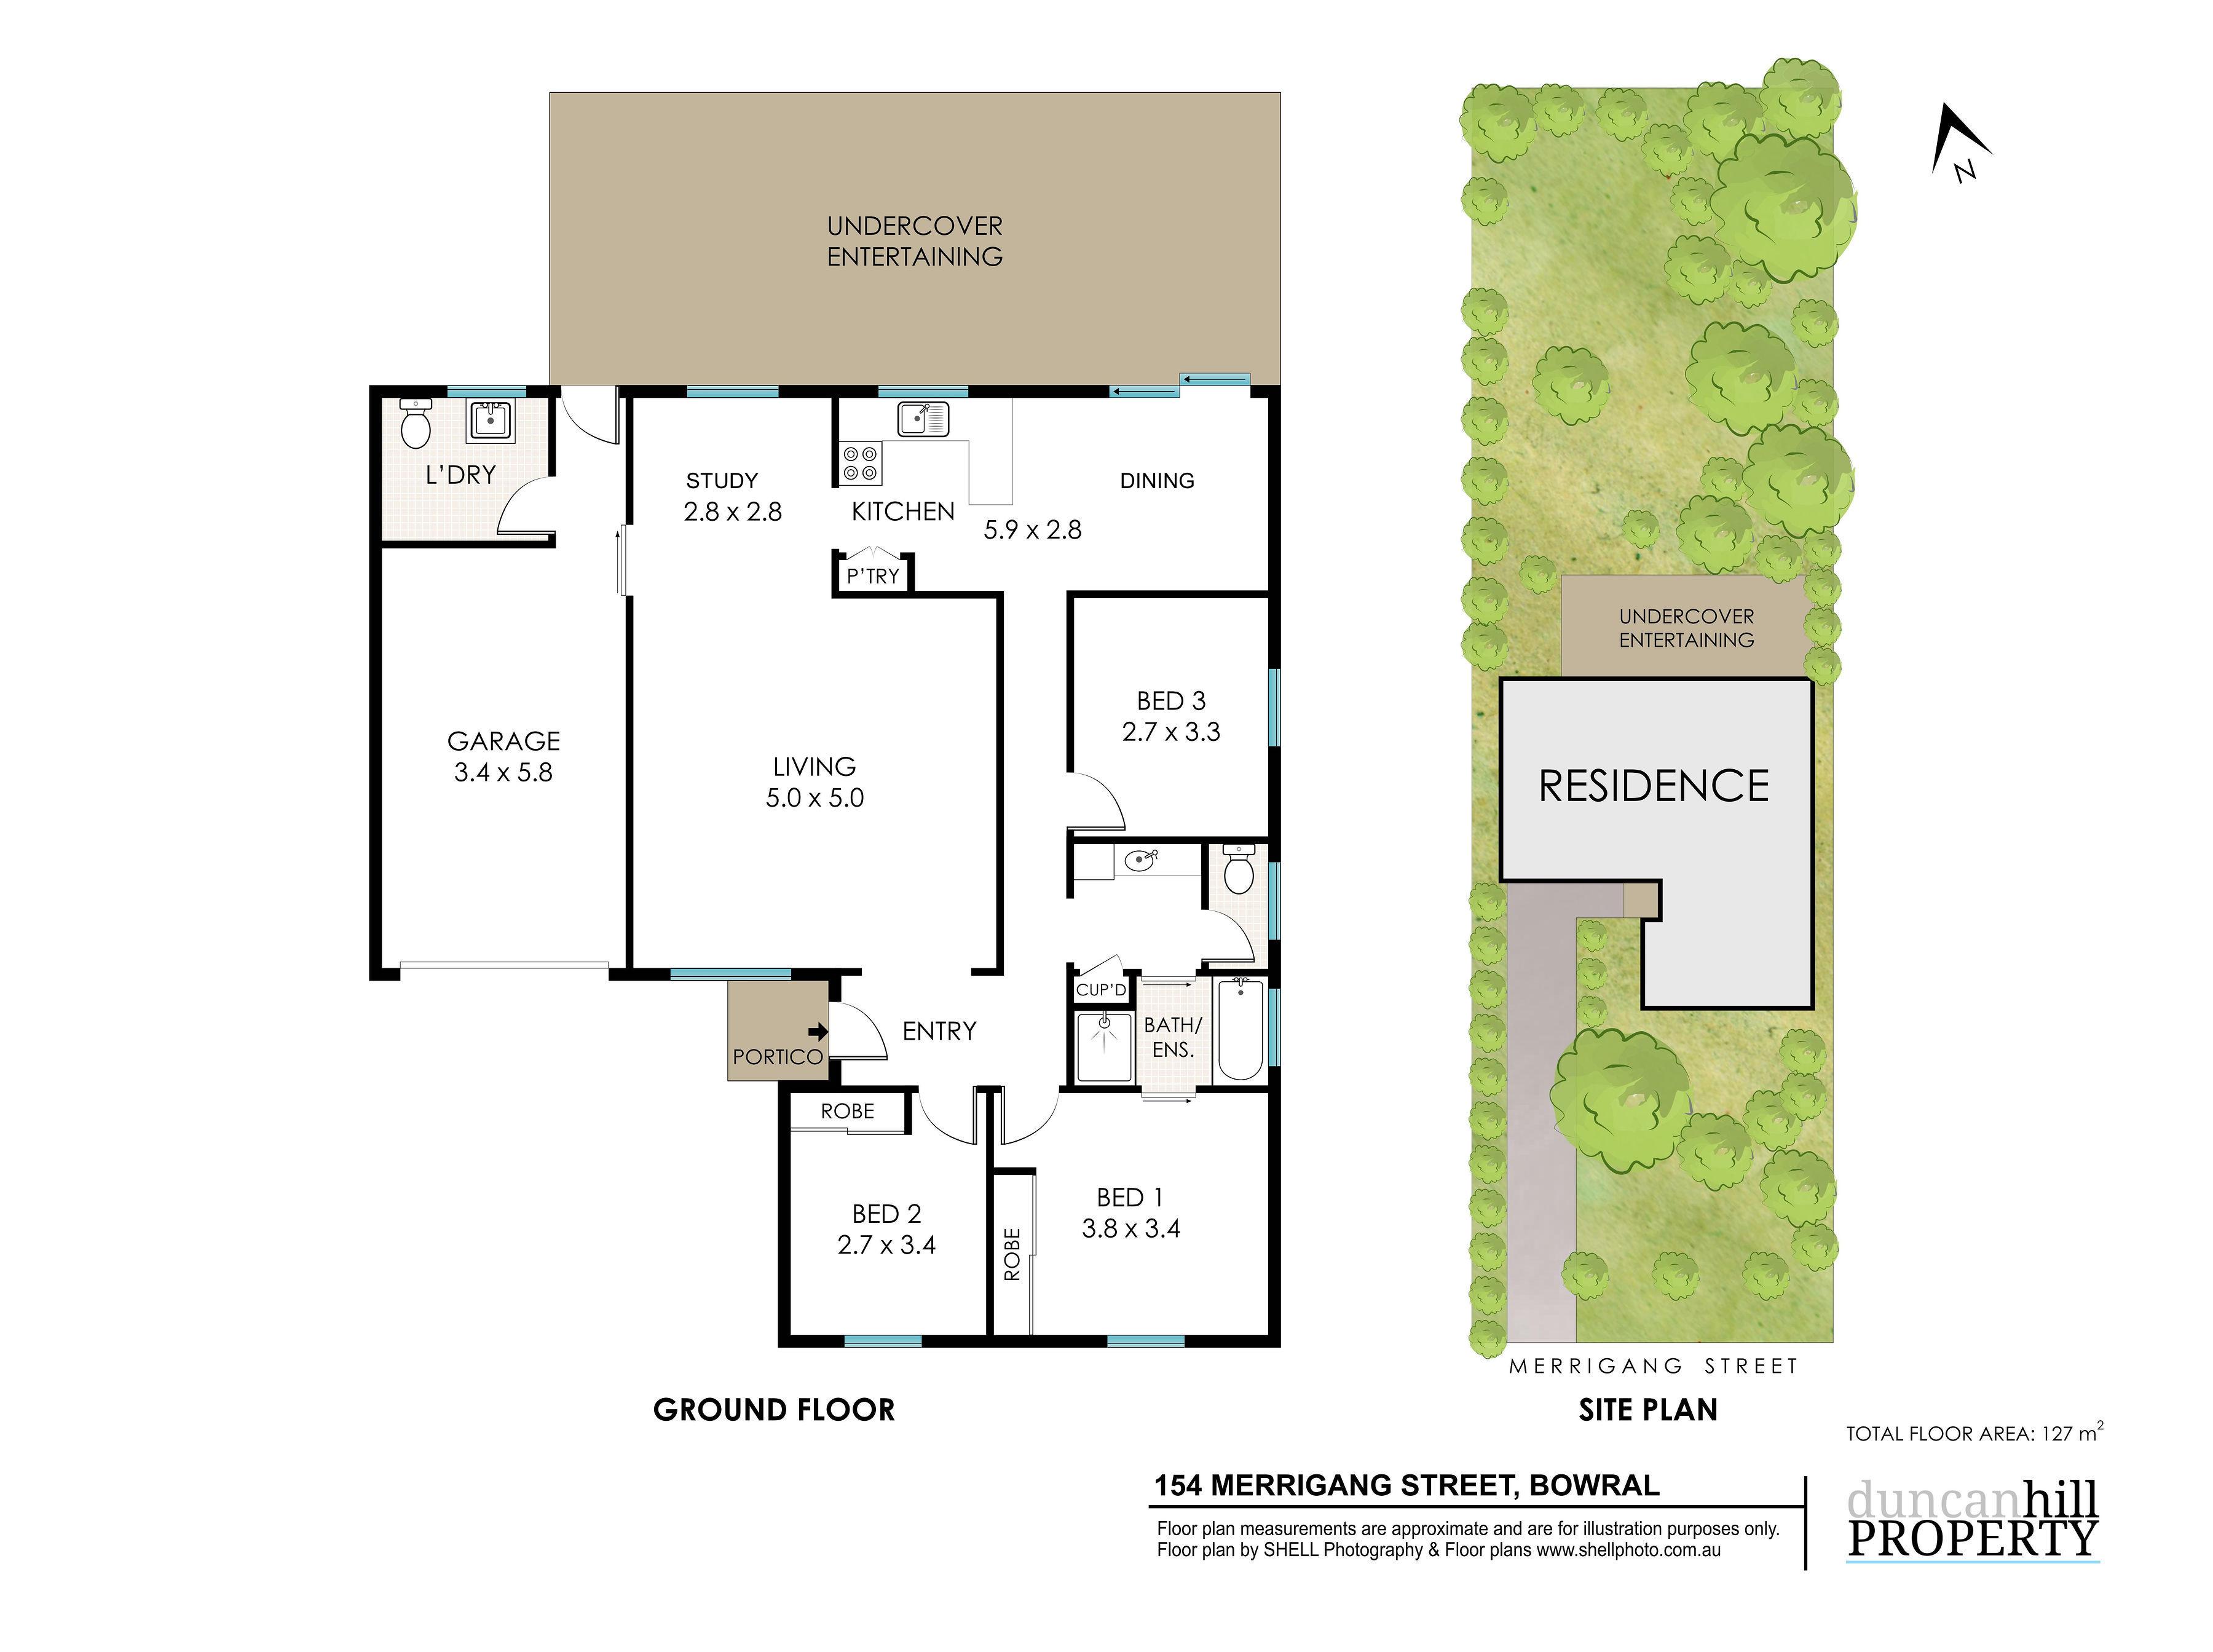 https://assets.boxdice.com.au/duncan_hill_property/listings/2174/3efe1318.jpg